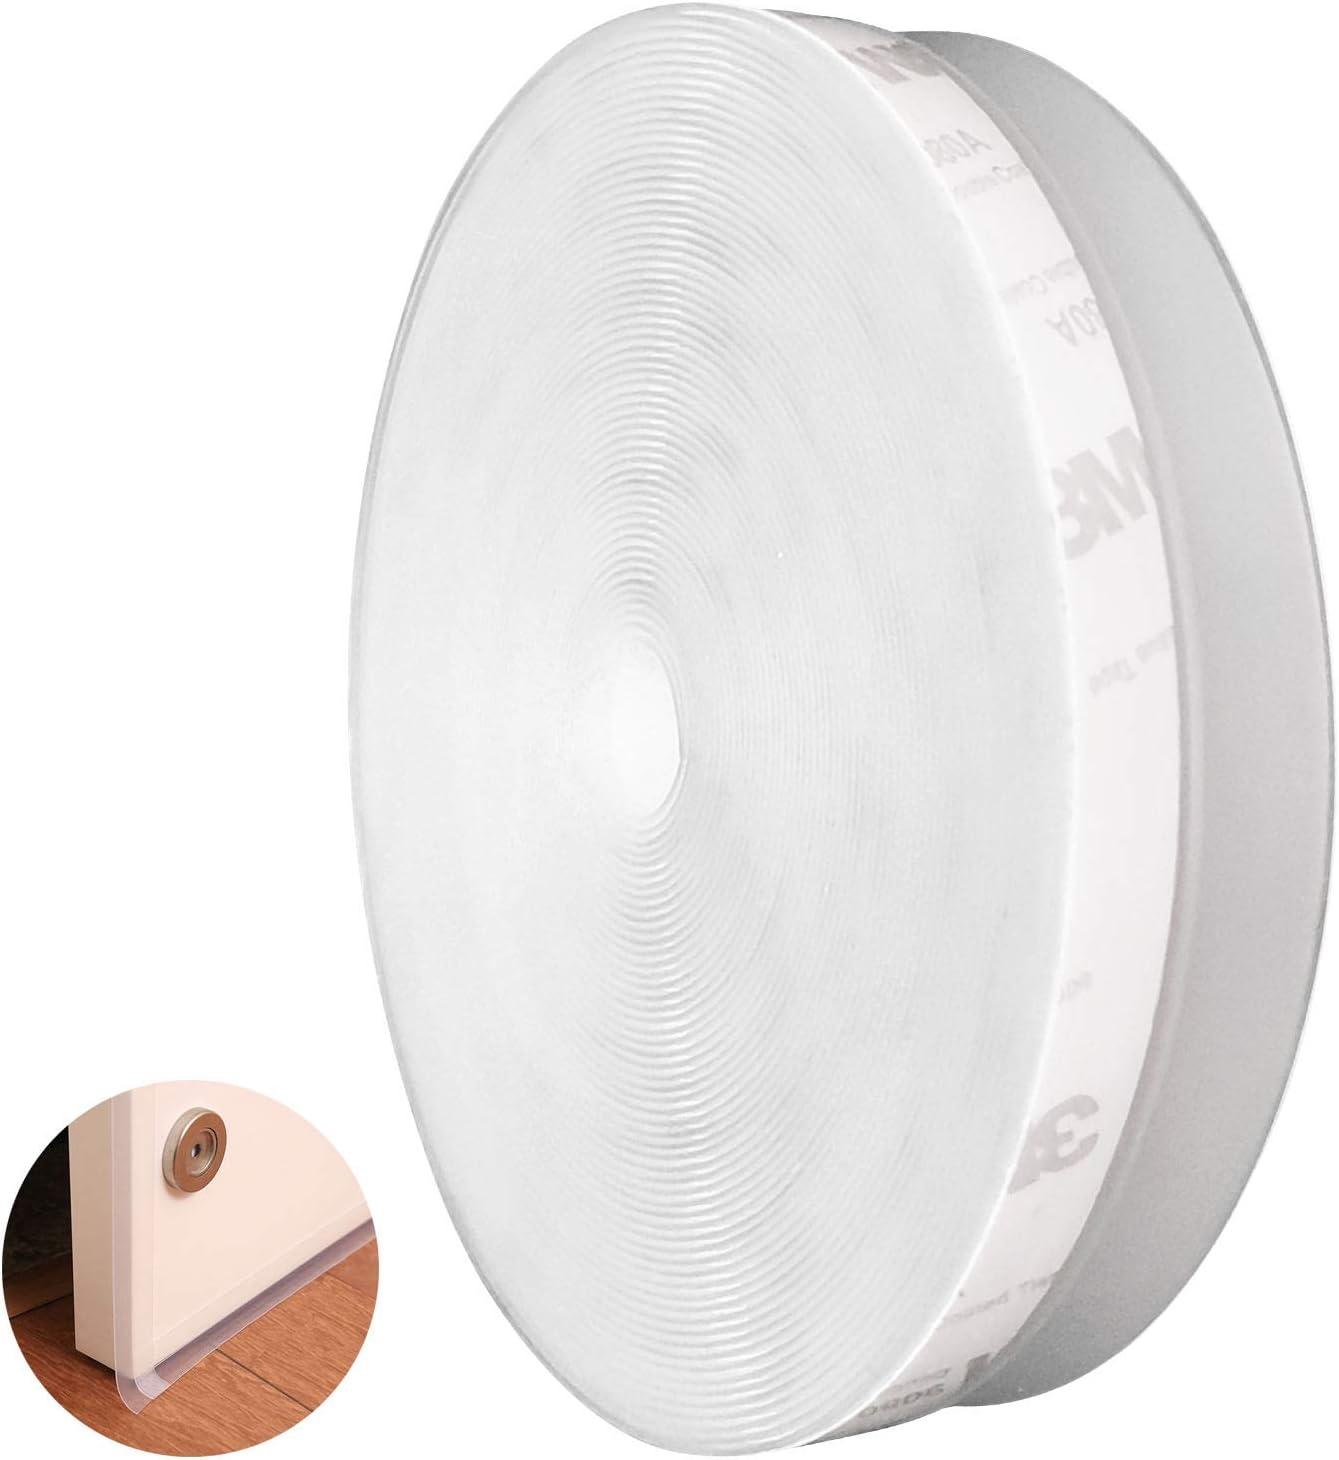 CUKCIC Tira de Sellado Autoadhesiva Silicona Burlete Cinta Calafateo para Puertas Ventanas Insonorizado 2×25mm×5m Transparente